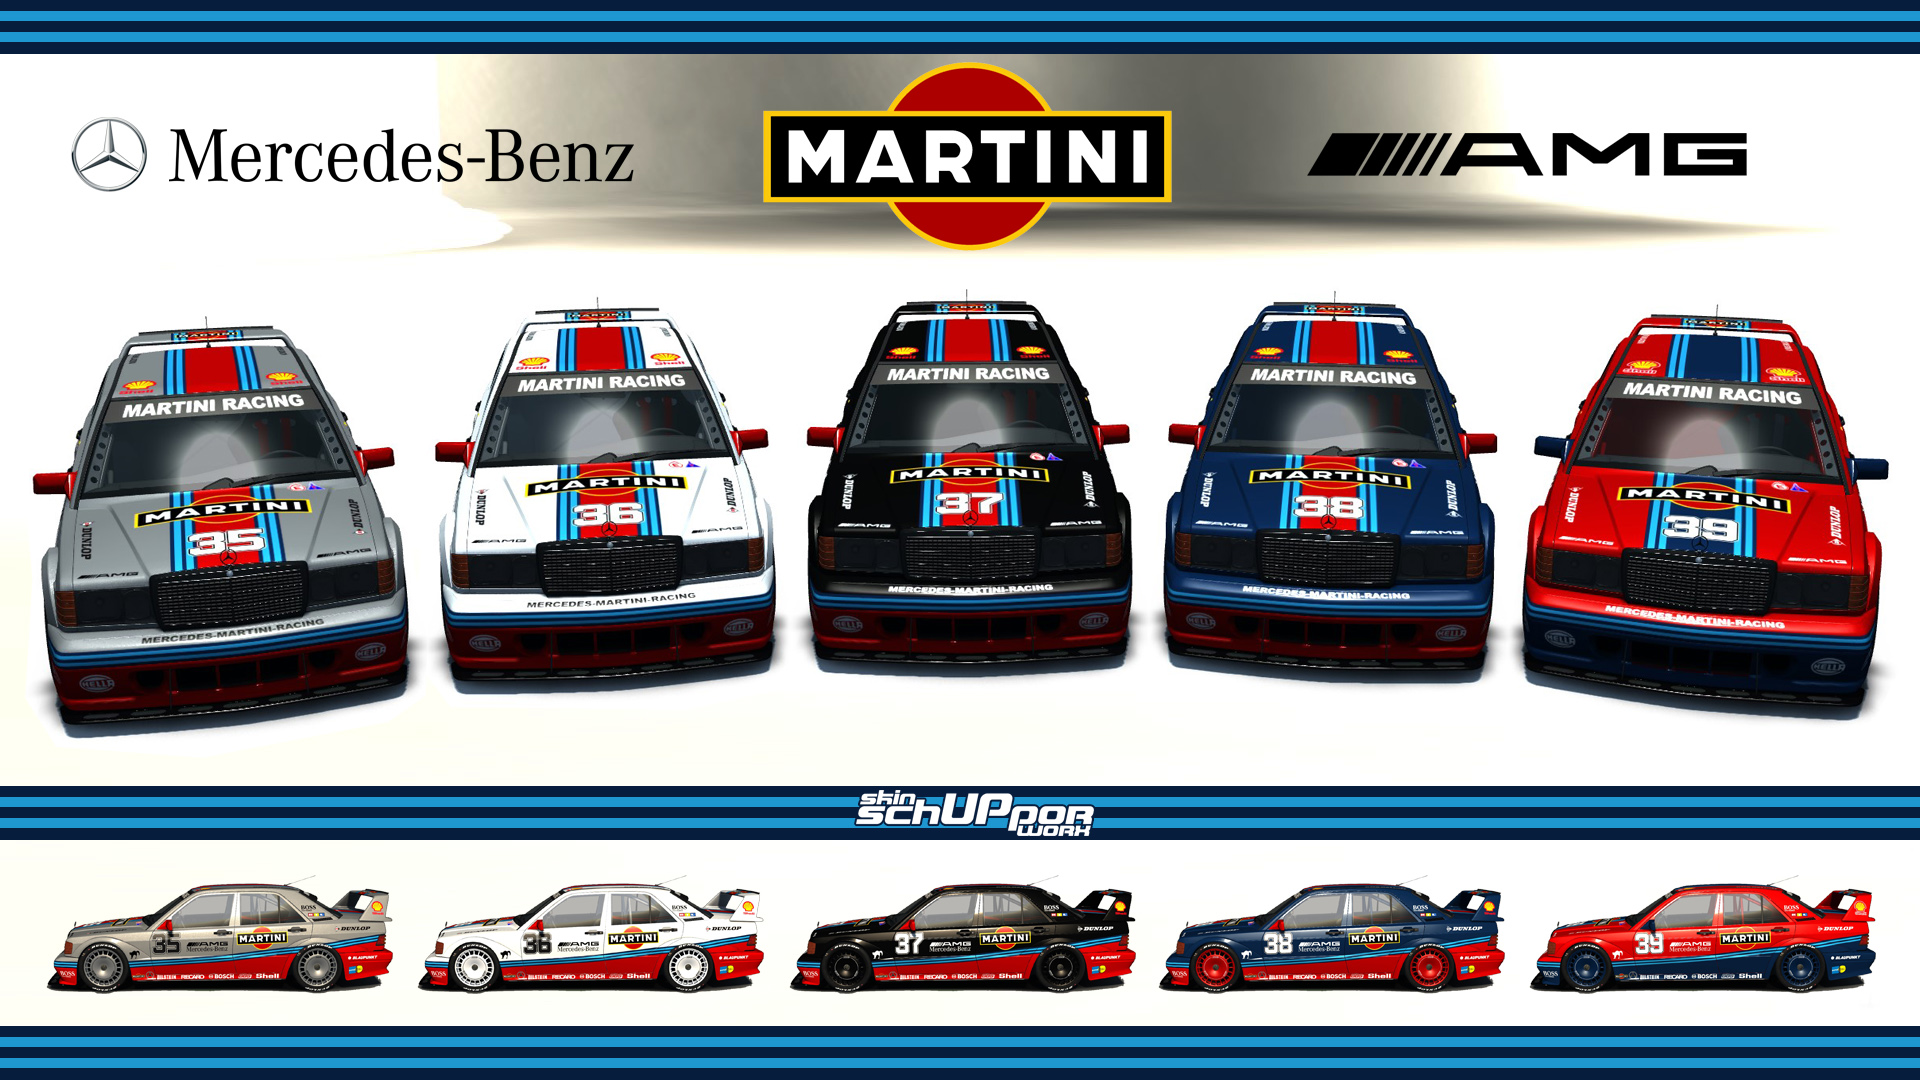 190_Martini_preview_s.jpg